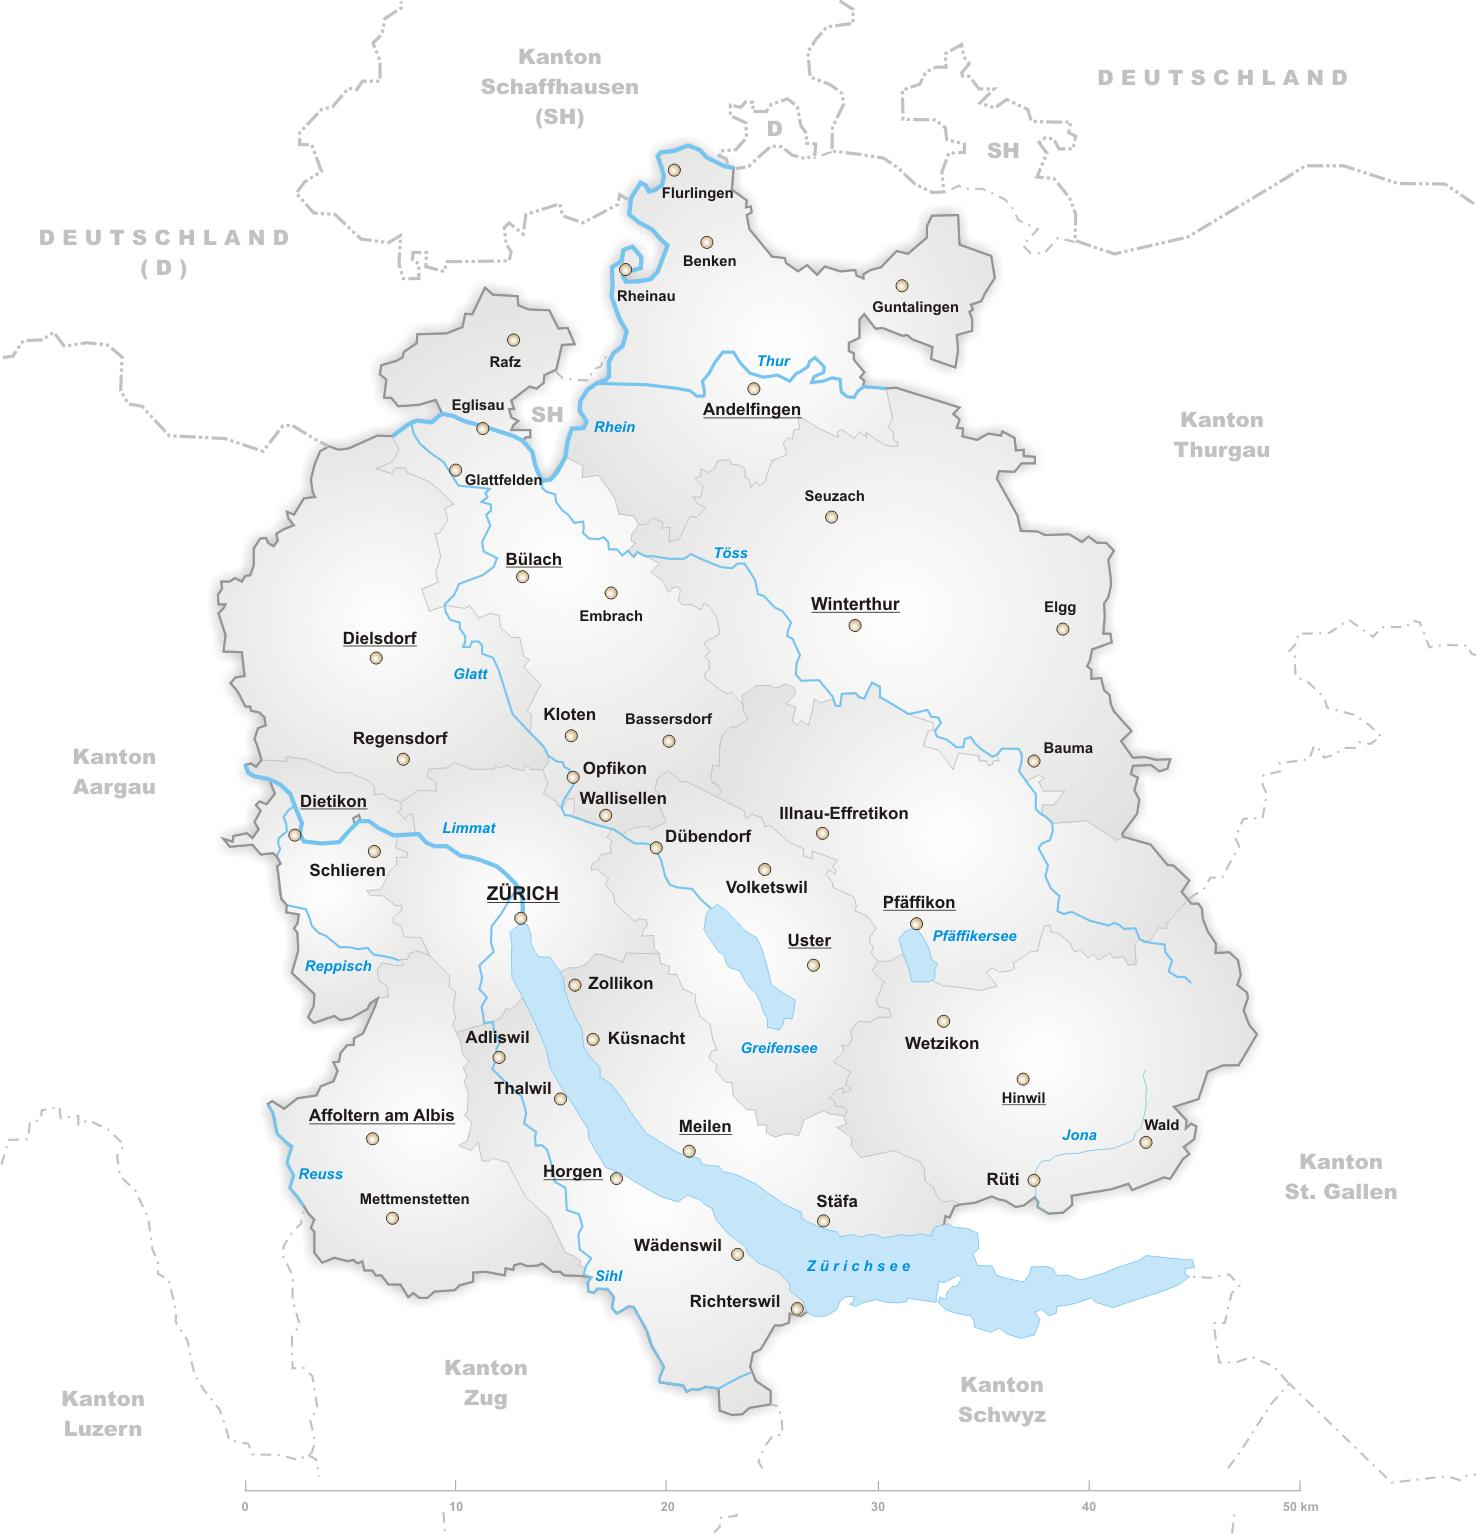 zürich karte Datei:Karte Kanton Zürich.png – Wikipedia